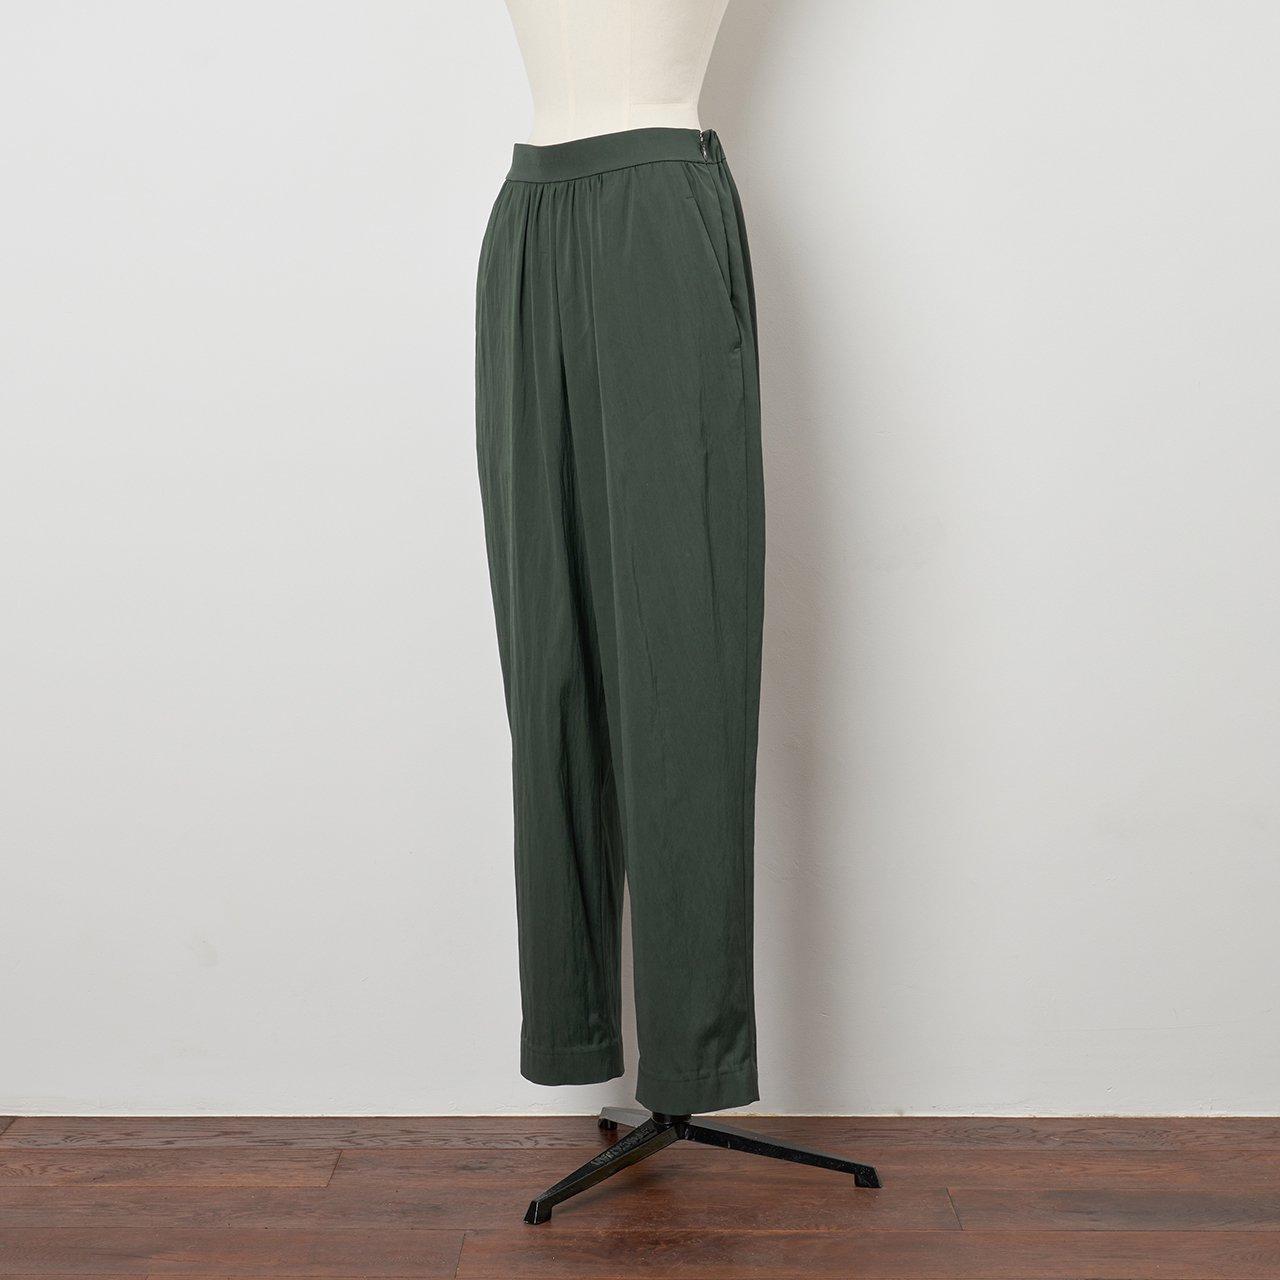 Pale Jute <BR>basic gather pants<BR>navy green